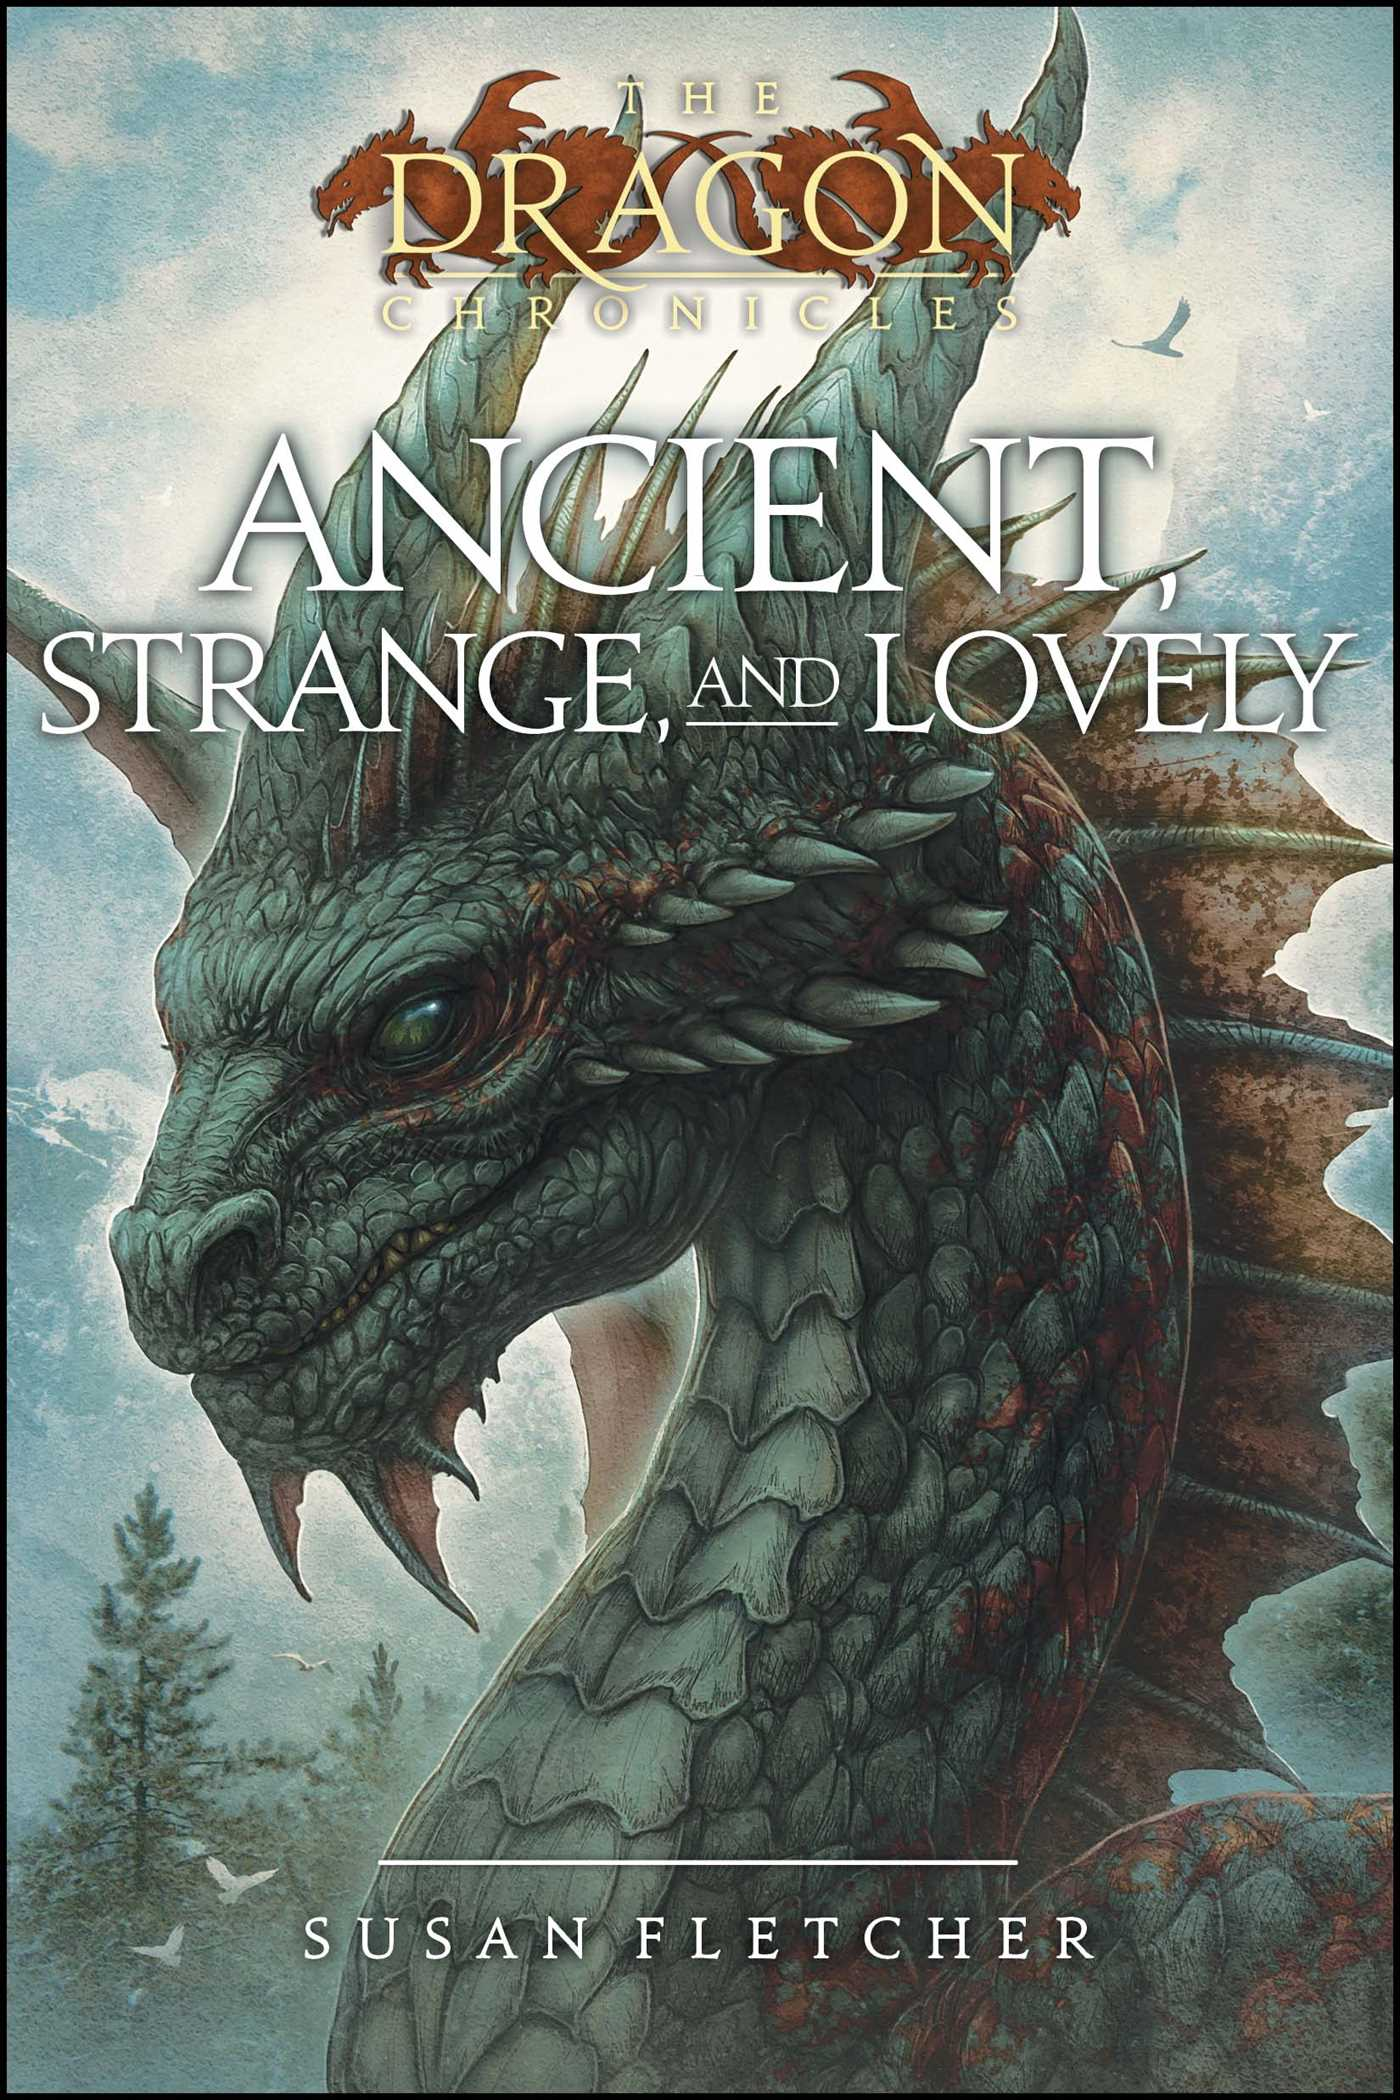 Ancient strange and lovely 9781416957874 hr